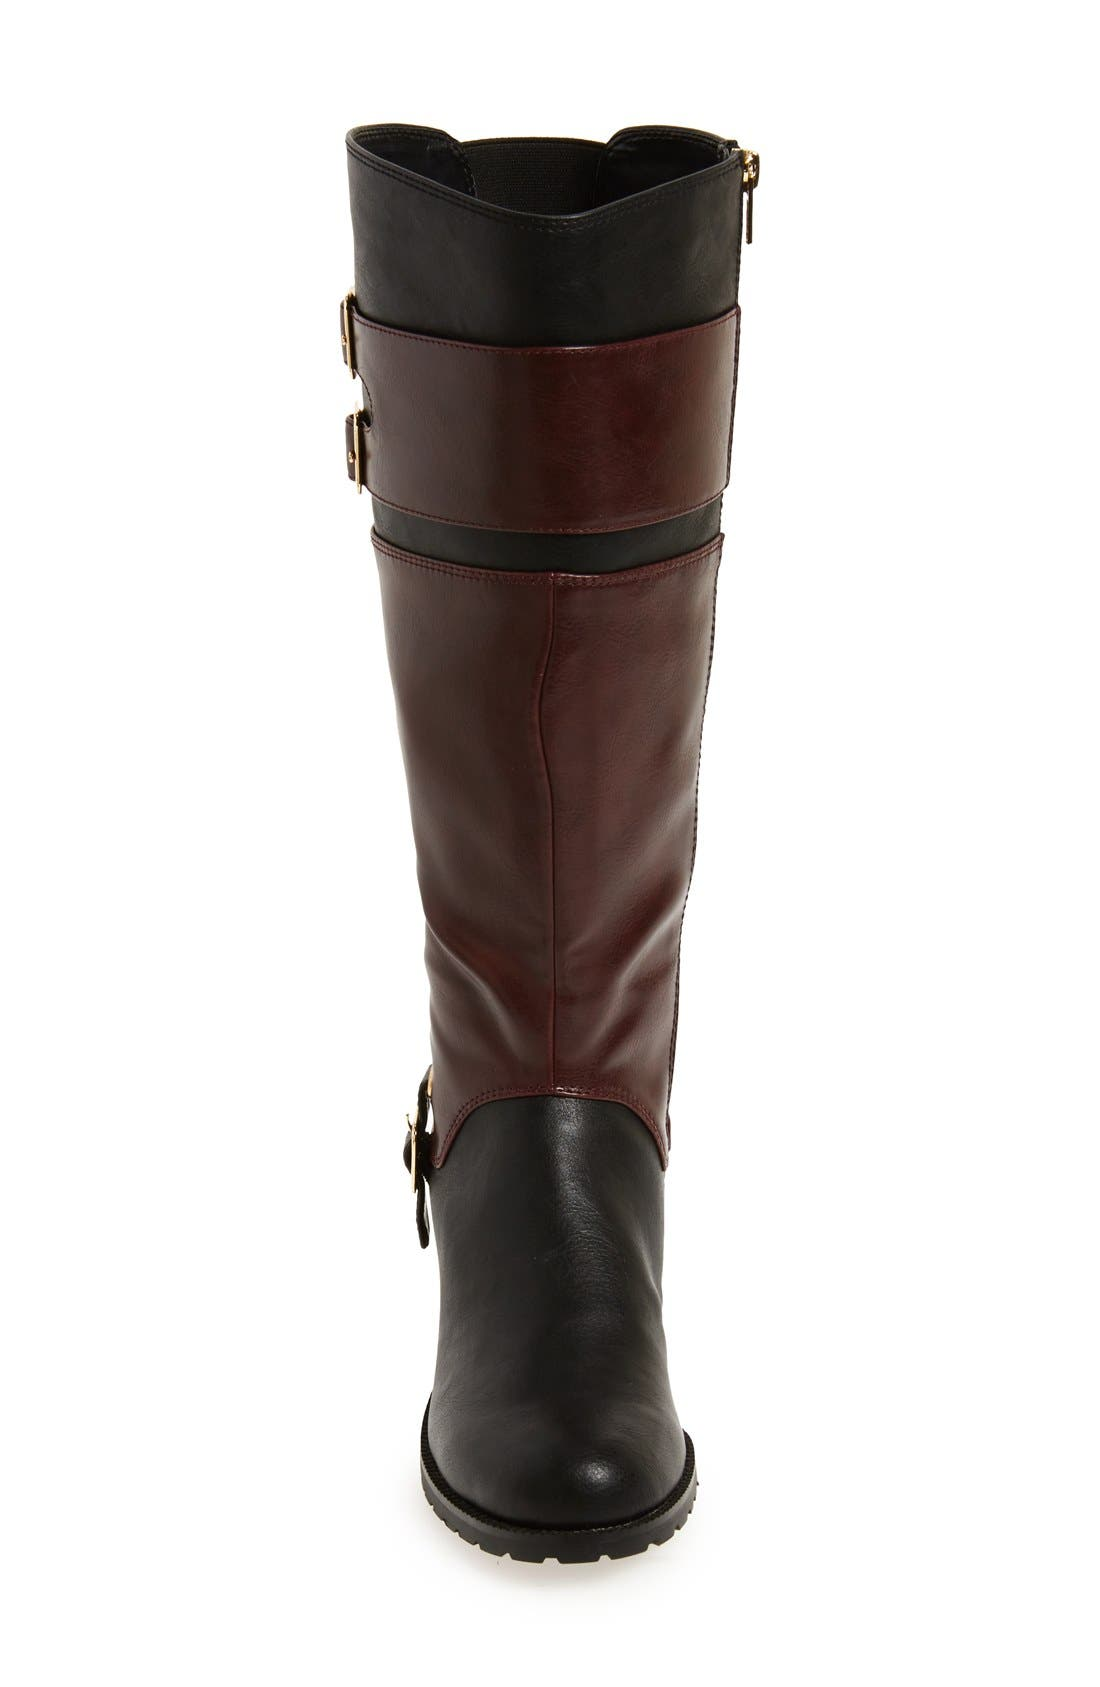 Alternate Image 3  - Bella Vita 'Adriann II' Knee High Boot (Women) (Wide Calf)